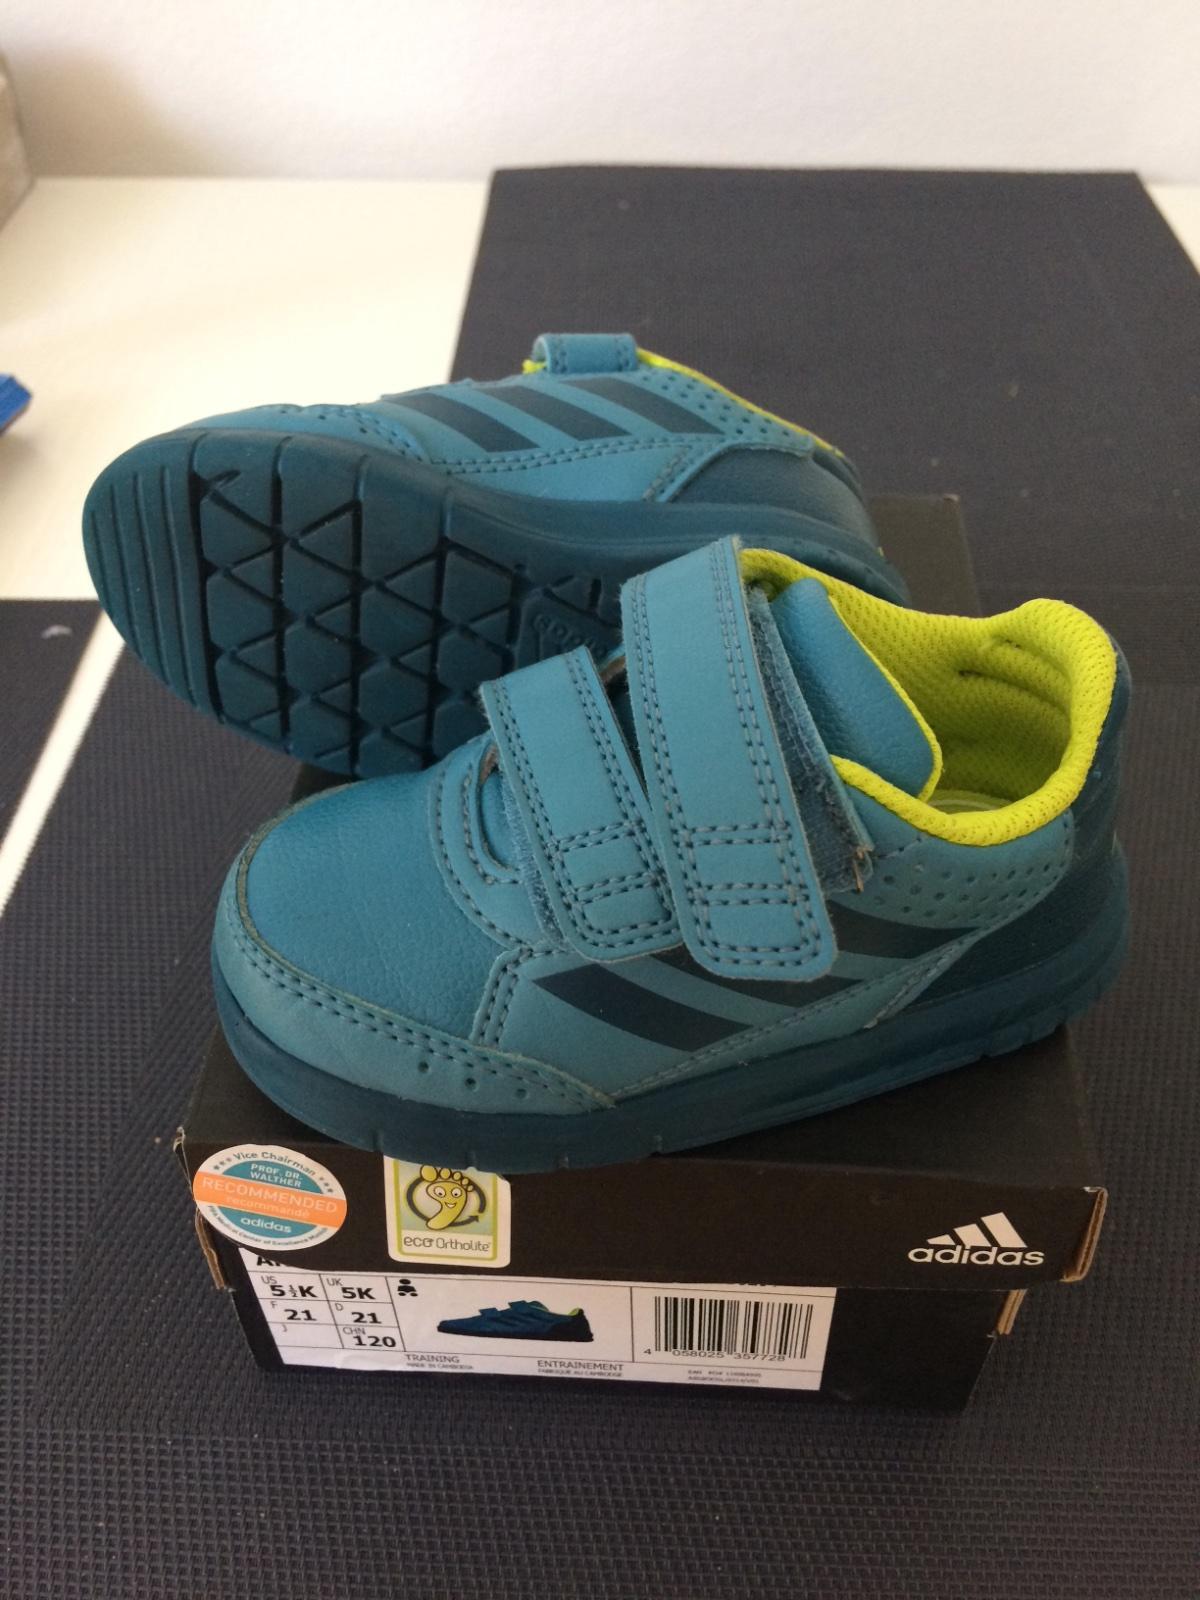 Adidas tenisky fd1fdf7a79b